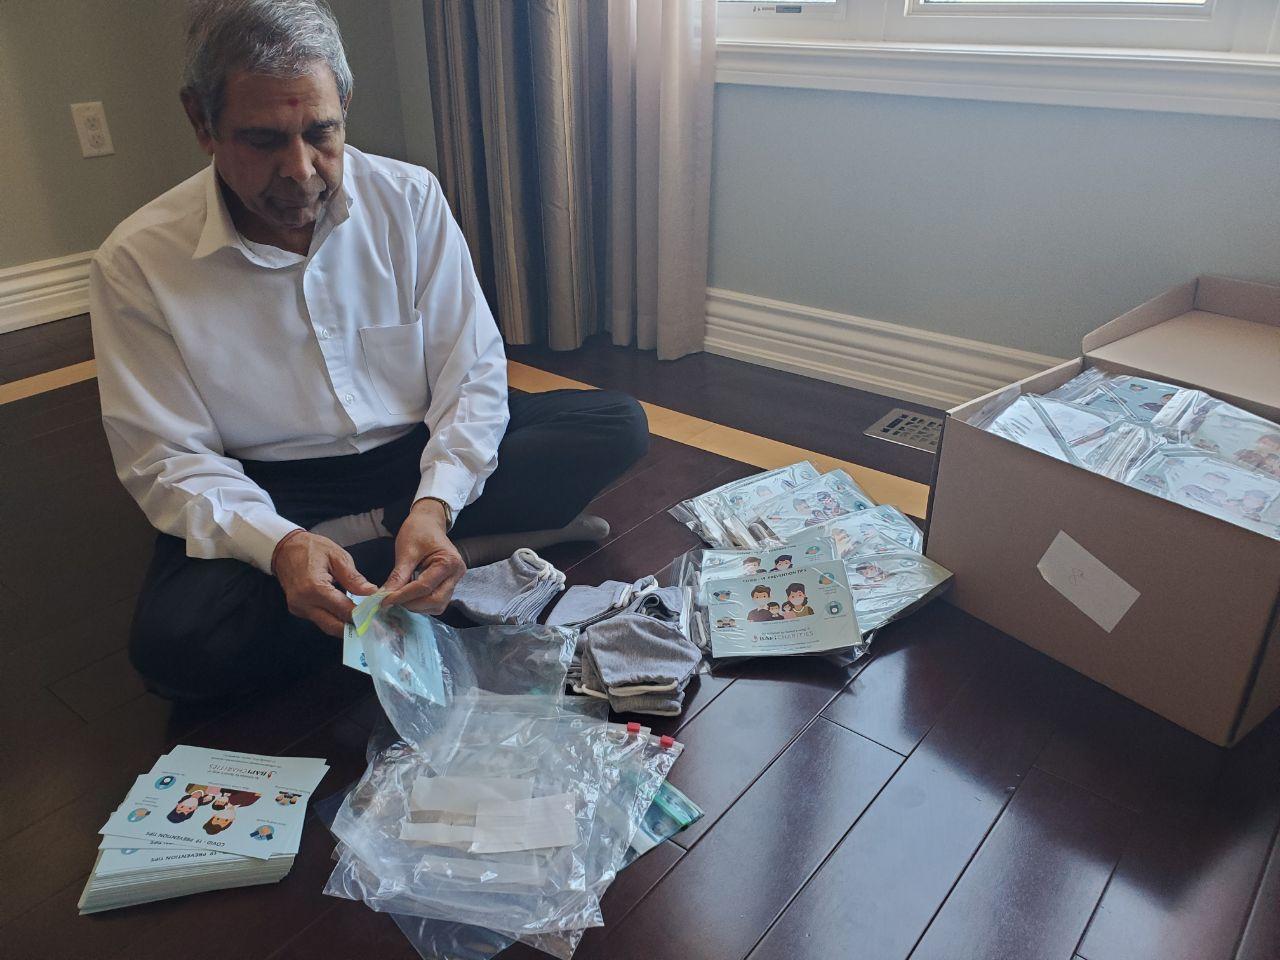 Baps Charities Covid 19 Pandemic Senior Volunteers Of Baps Charities Help To Make 1 700 Care Packages Toronto On